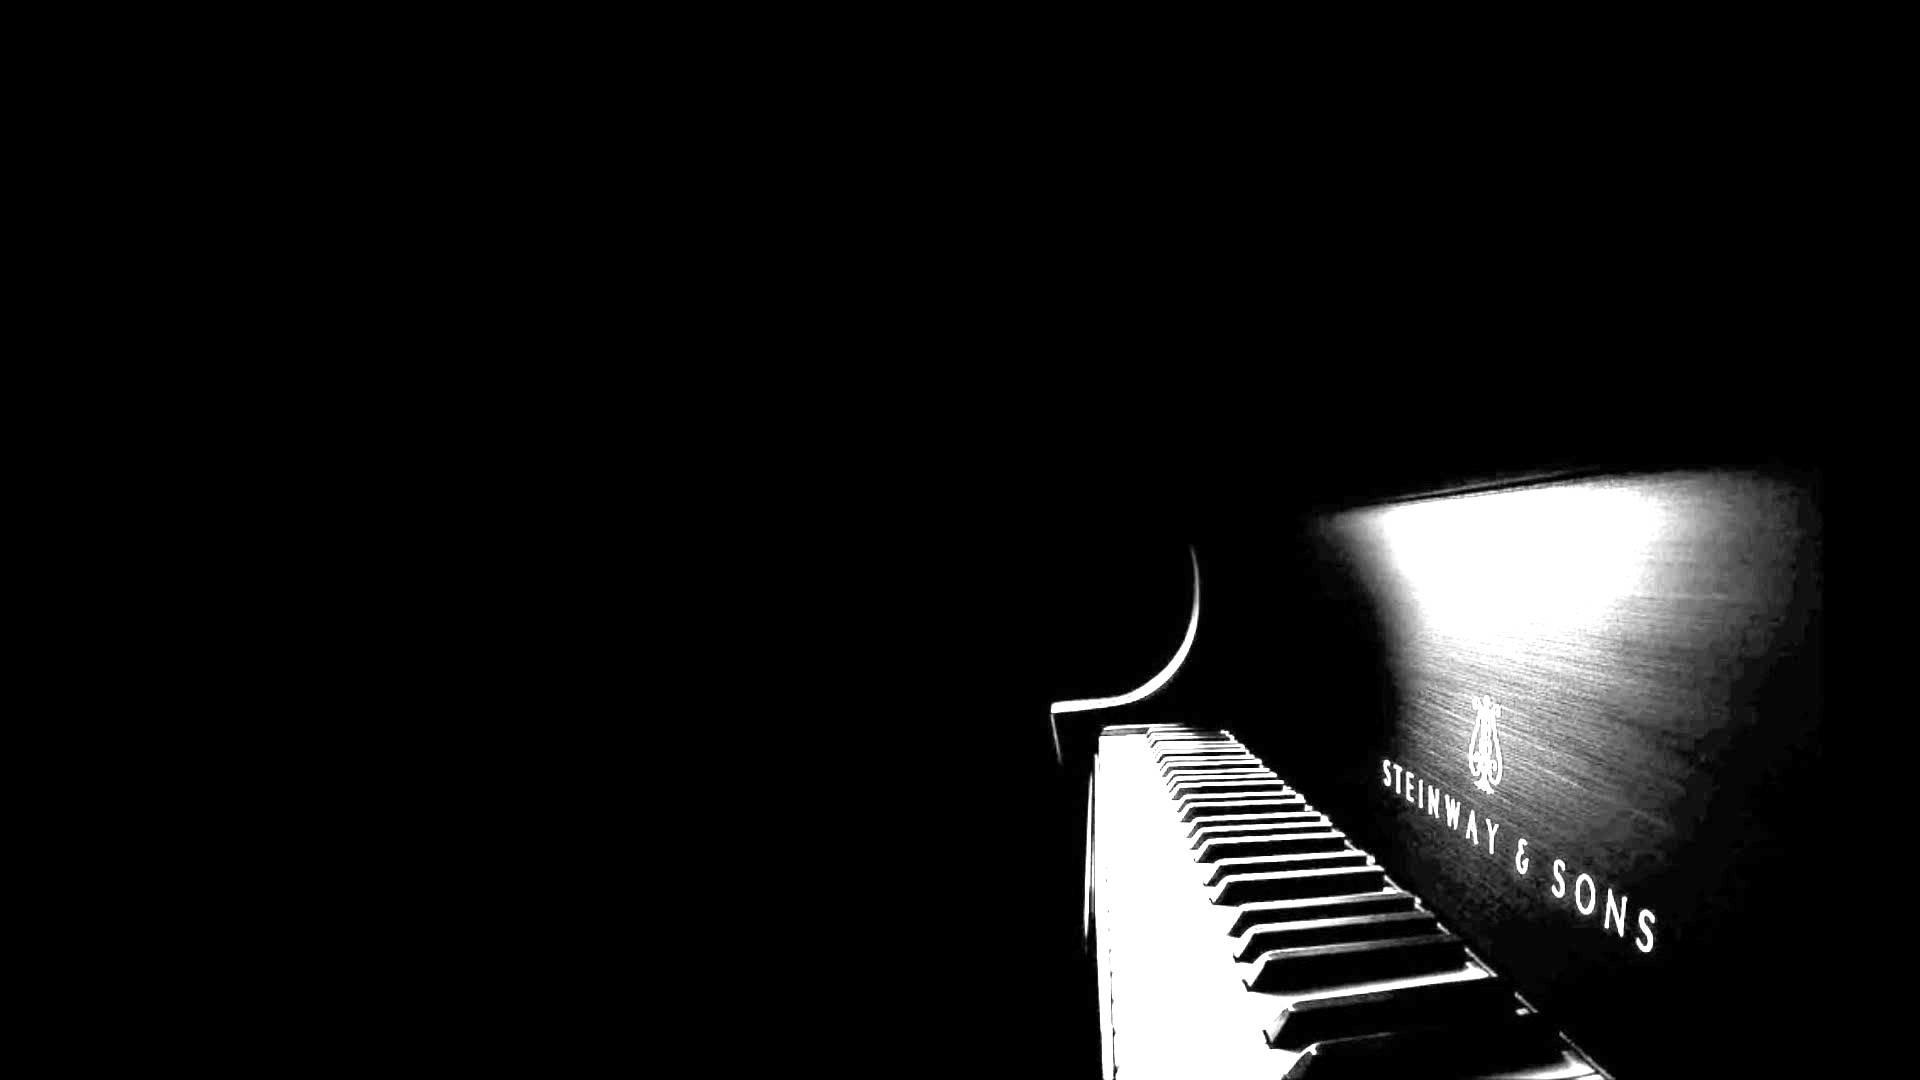 Afecto – Farewell [Sad Piano Violin Music]